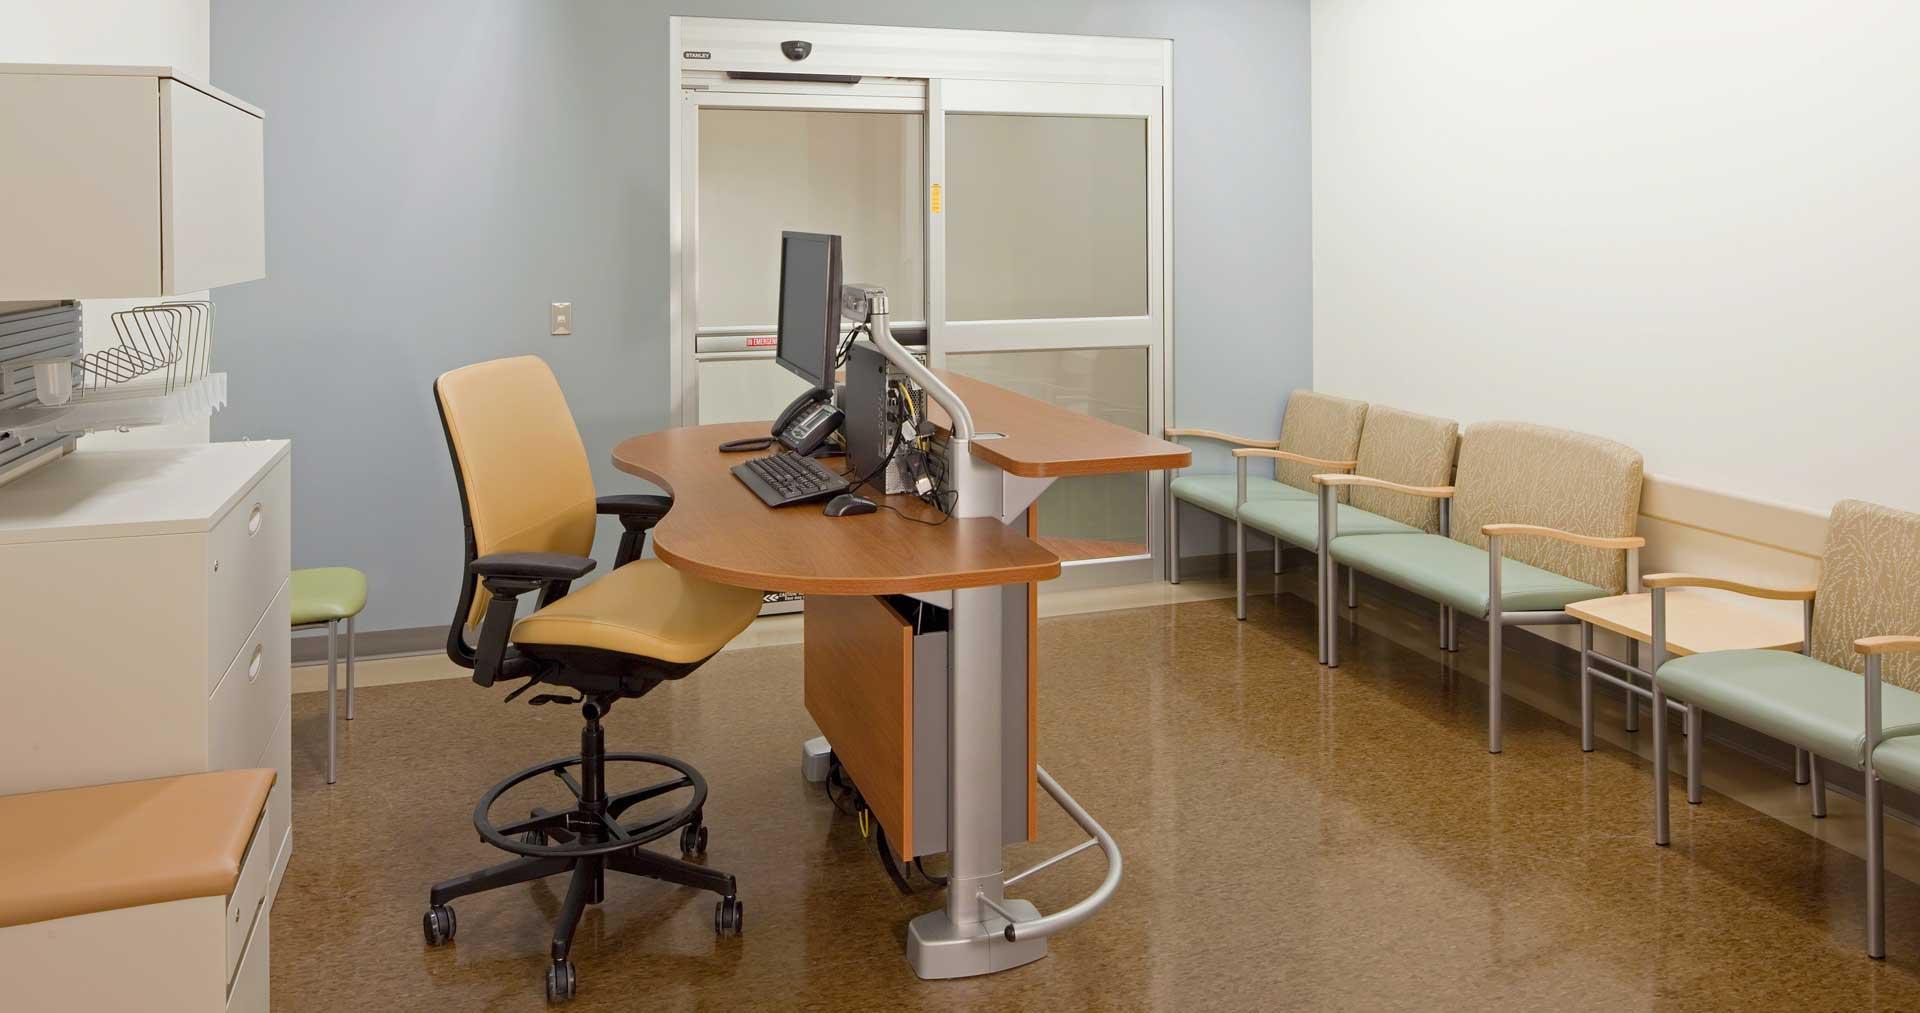 Sync-Systems-Aspekt-Chairs-Amia-Stool-10-0002430.DL17